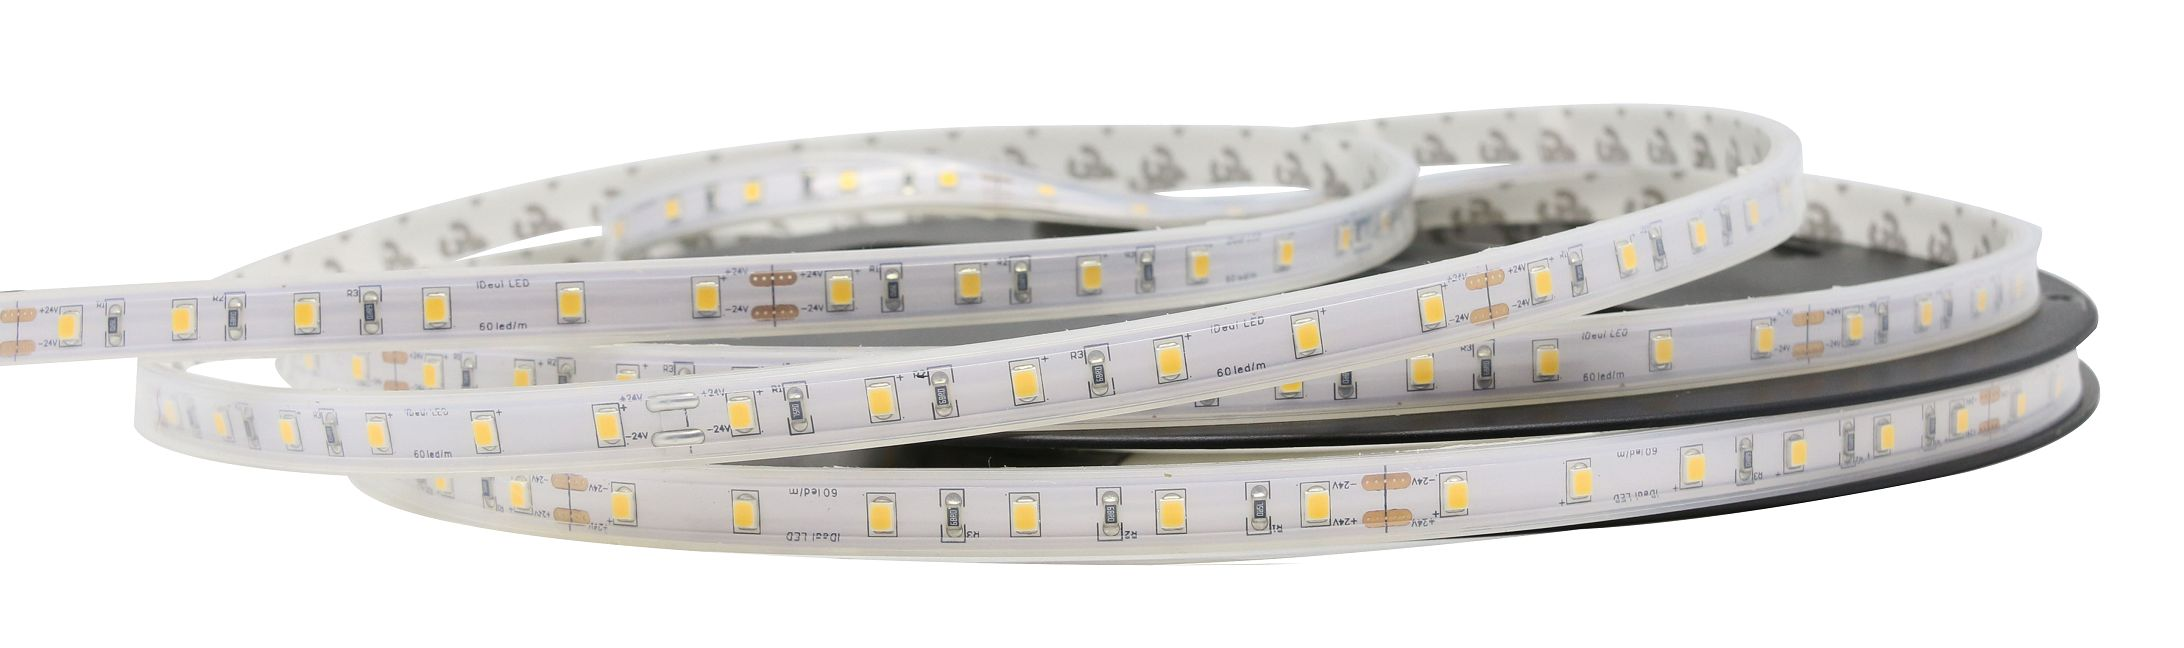 LED Striplight S2360-24-WP-7.2W